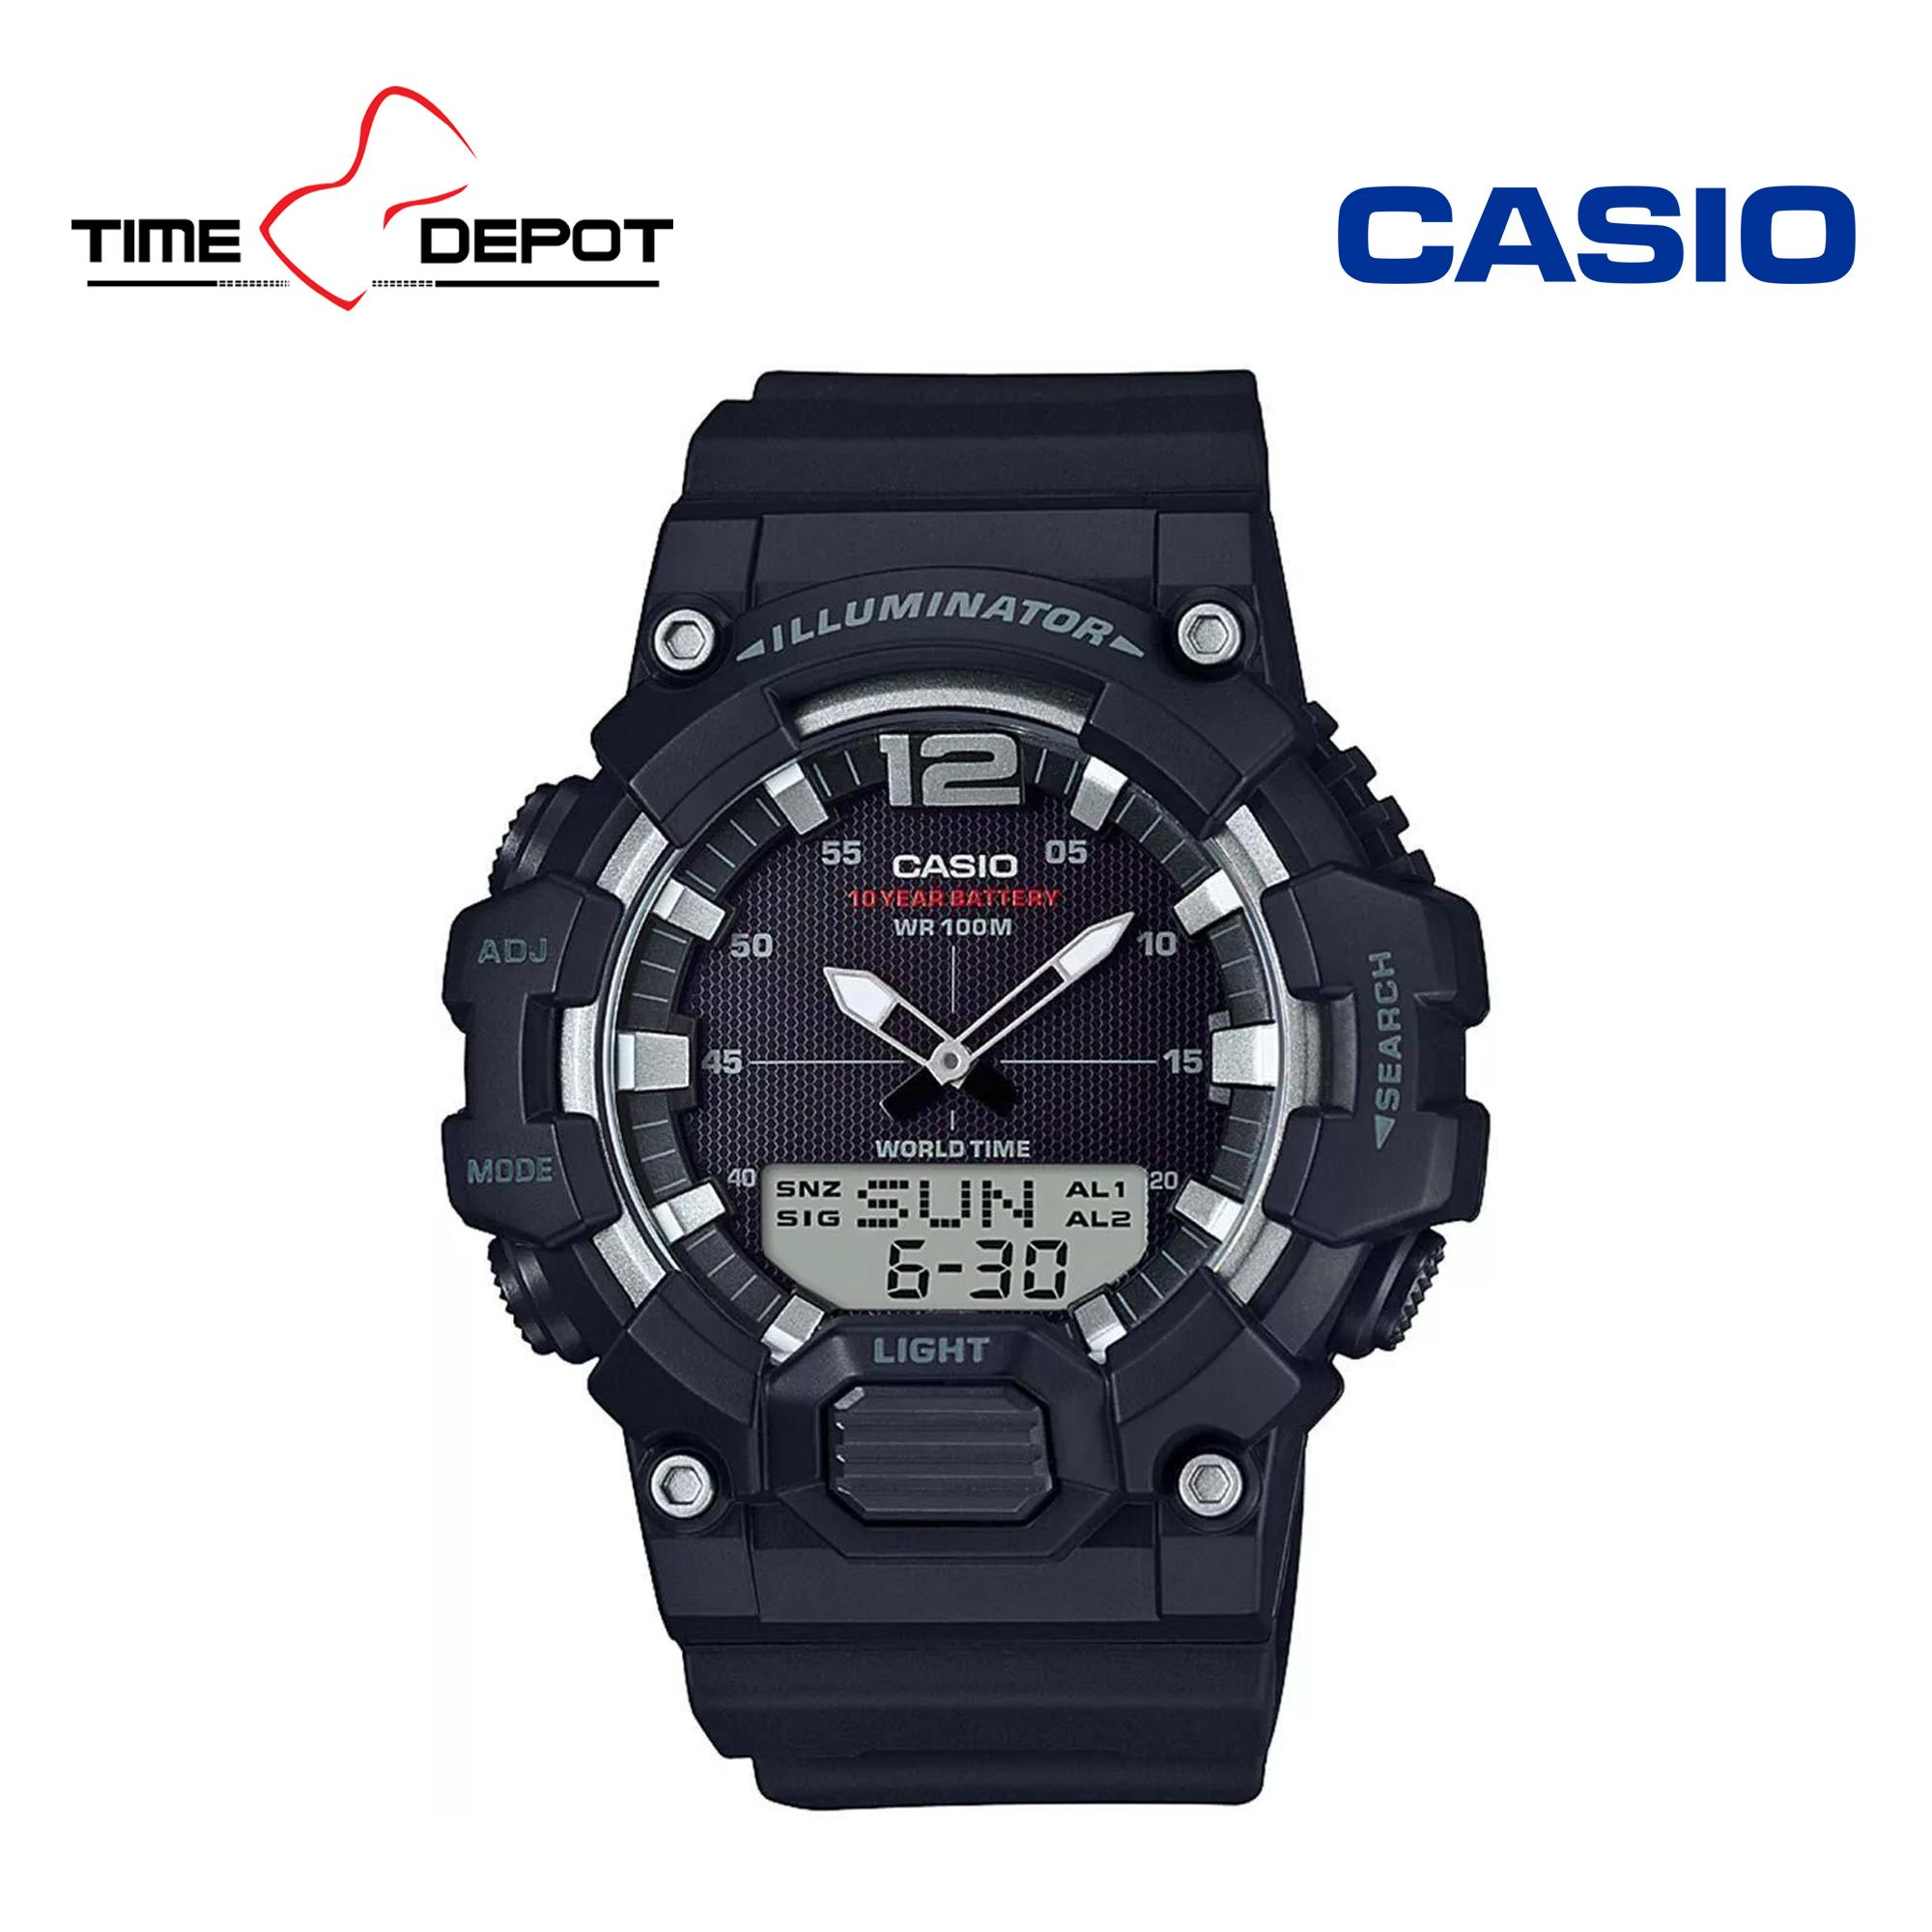 Casio Men's Analog Digital Illuminator Black Resin Strap Watch HDC-700-1AVDF